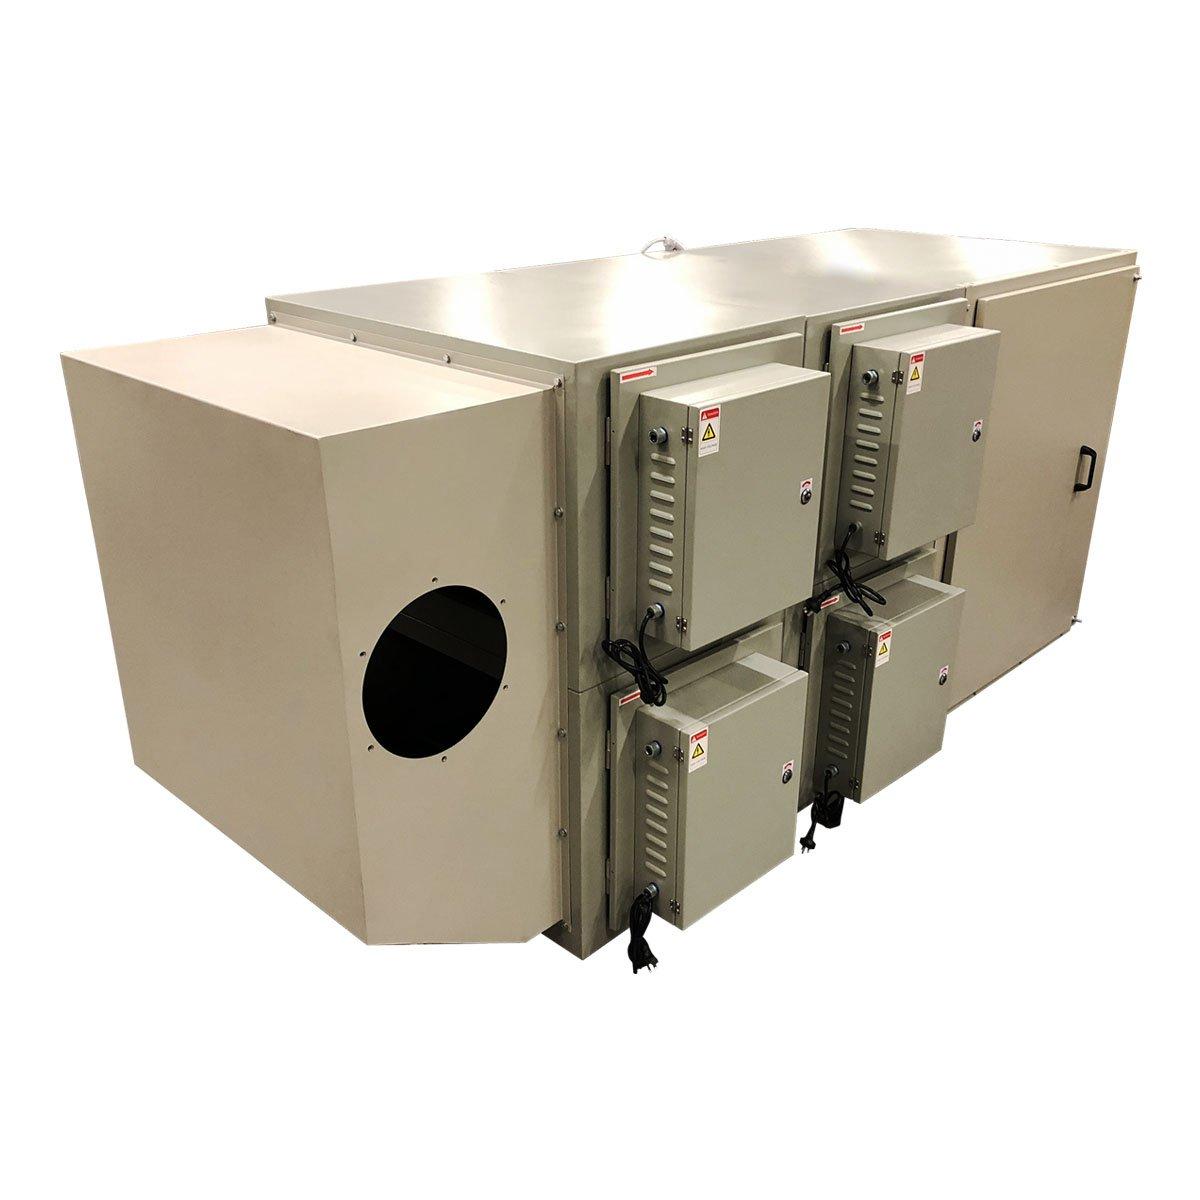 SMOG-HOG filtri elettrostatici modulari per impianti aspirazione aria